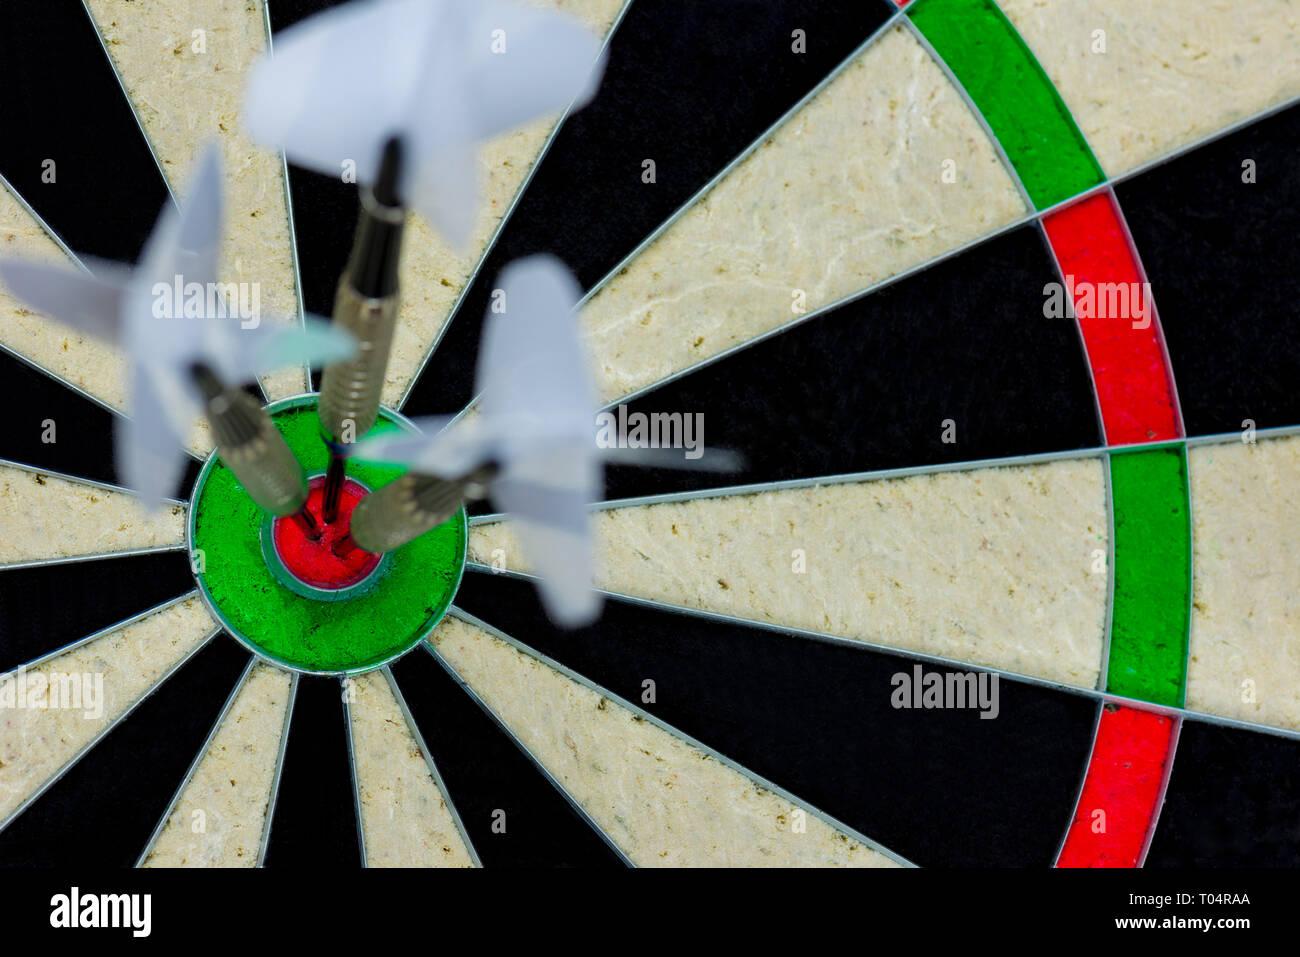 three darts thrown at the bulls eye of a dartboard - Stock Image